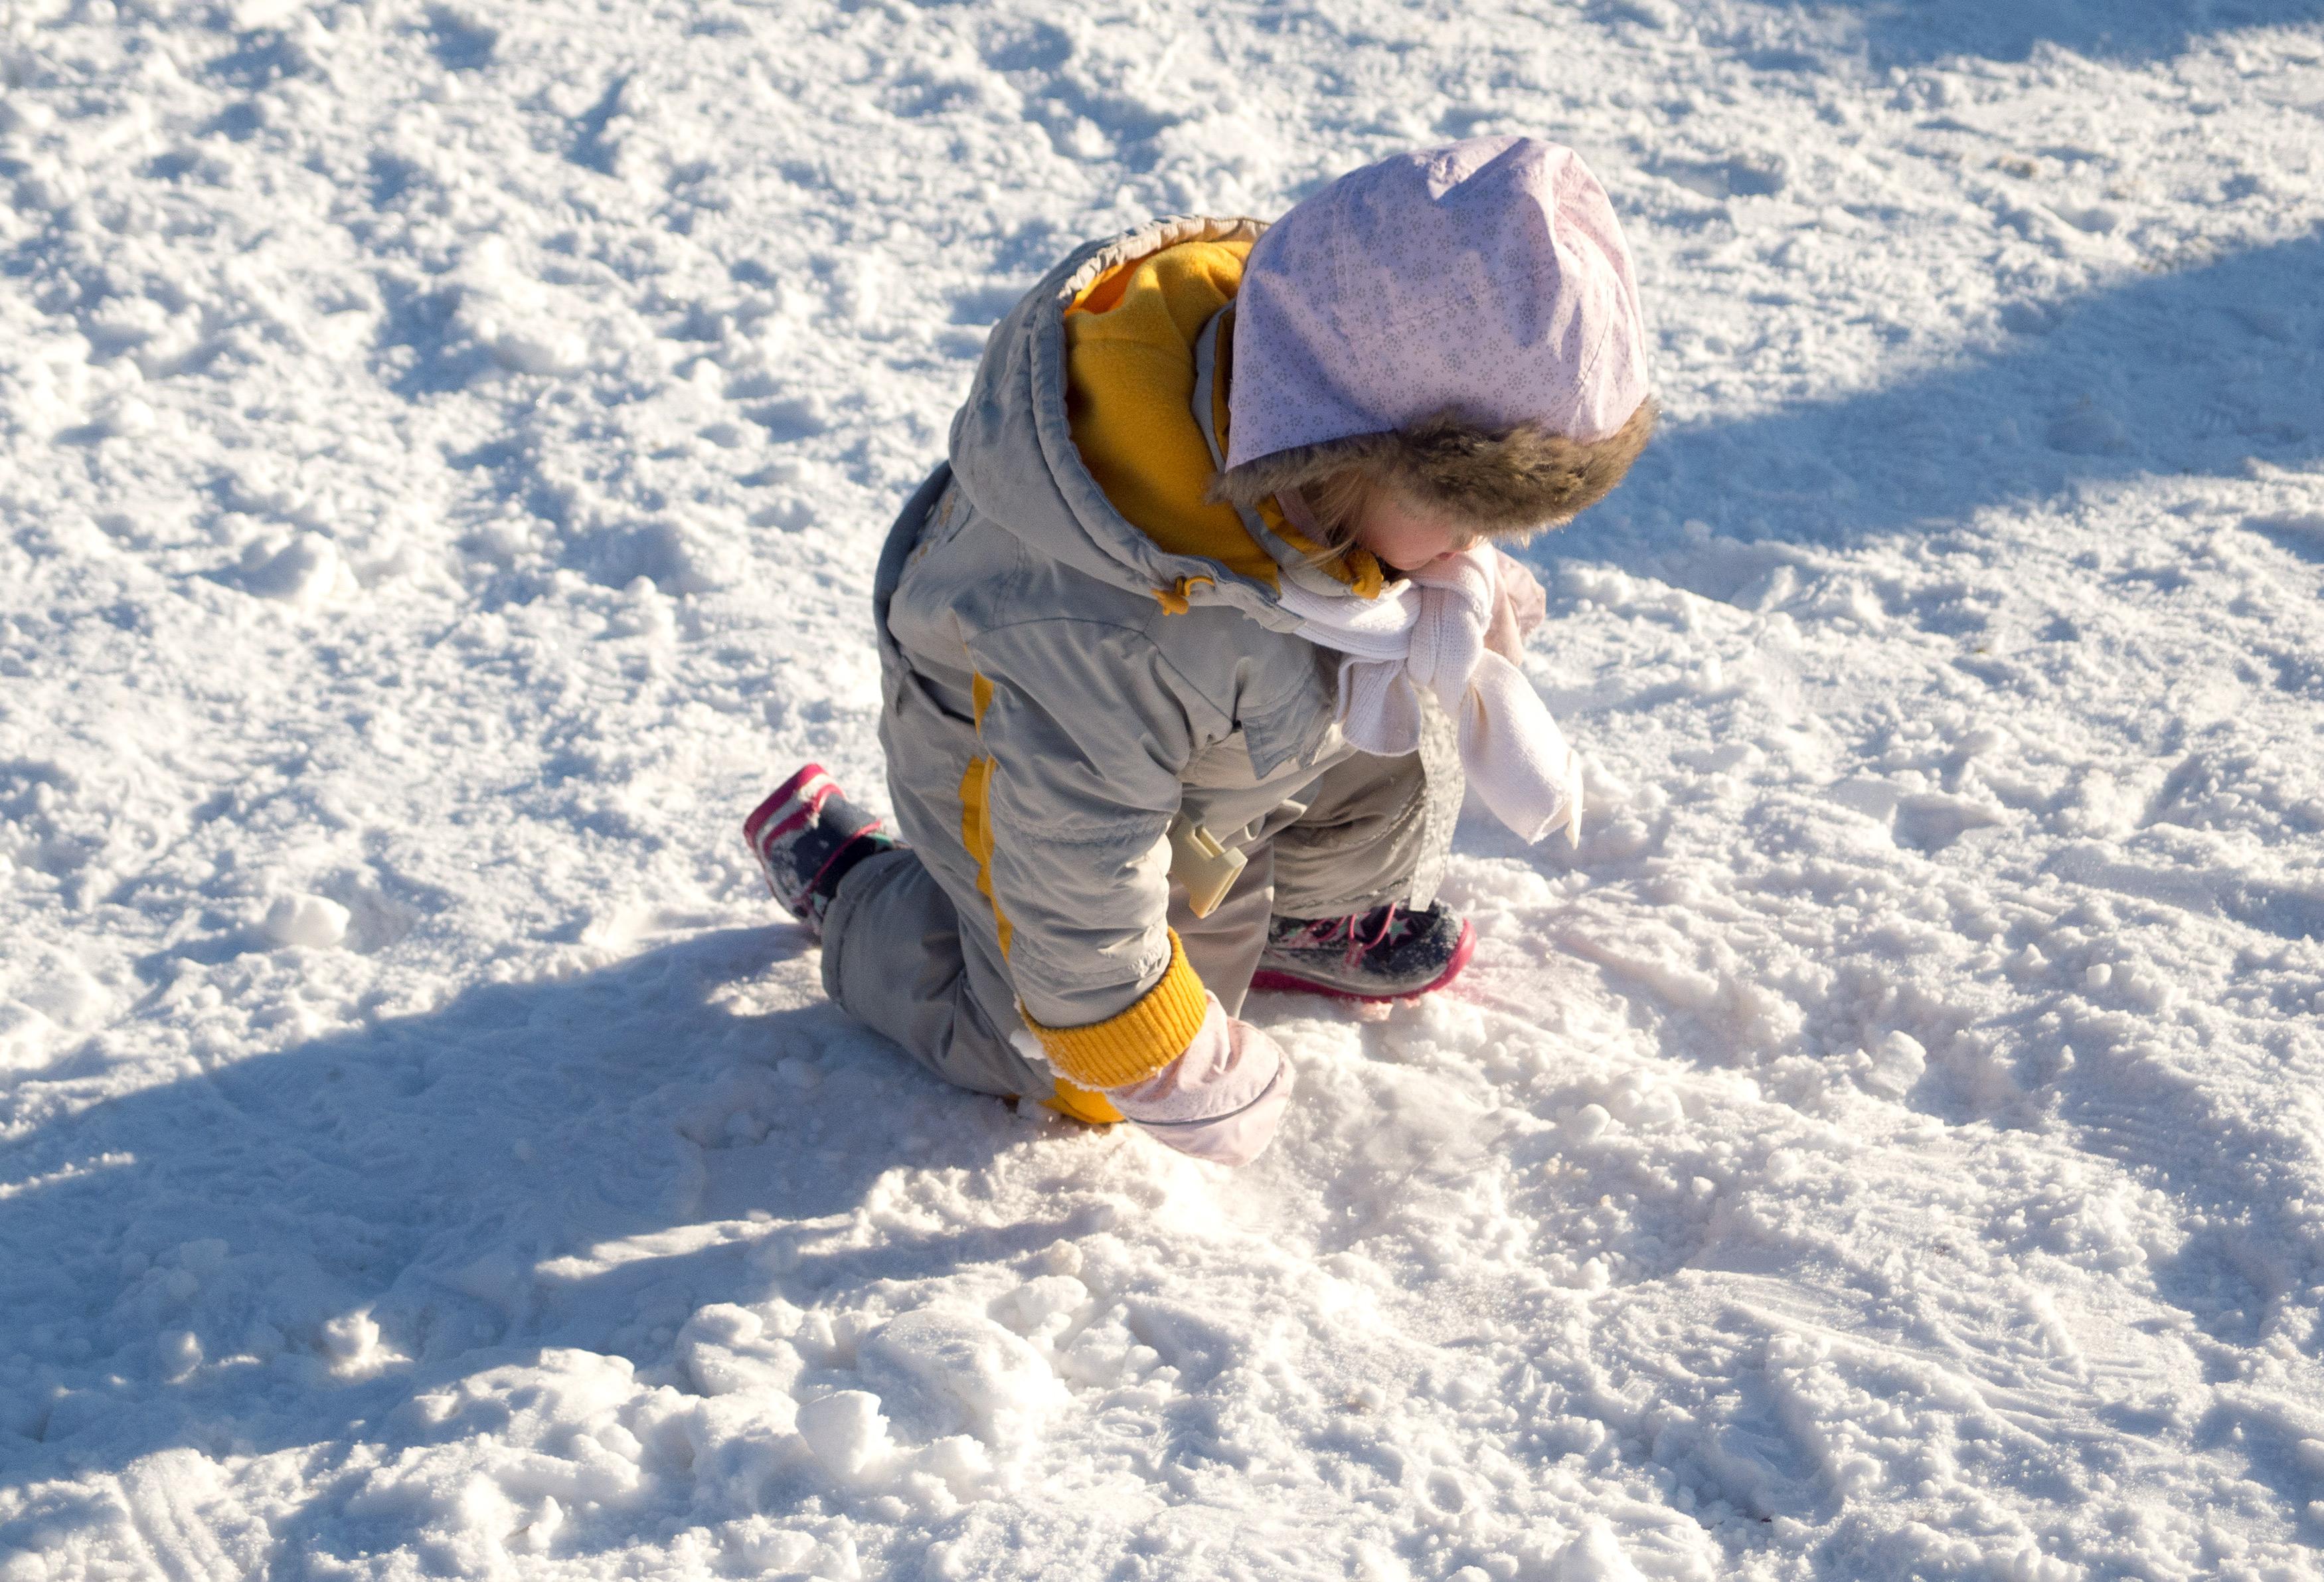 Children On Snow | FREE image on LibreShot